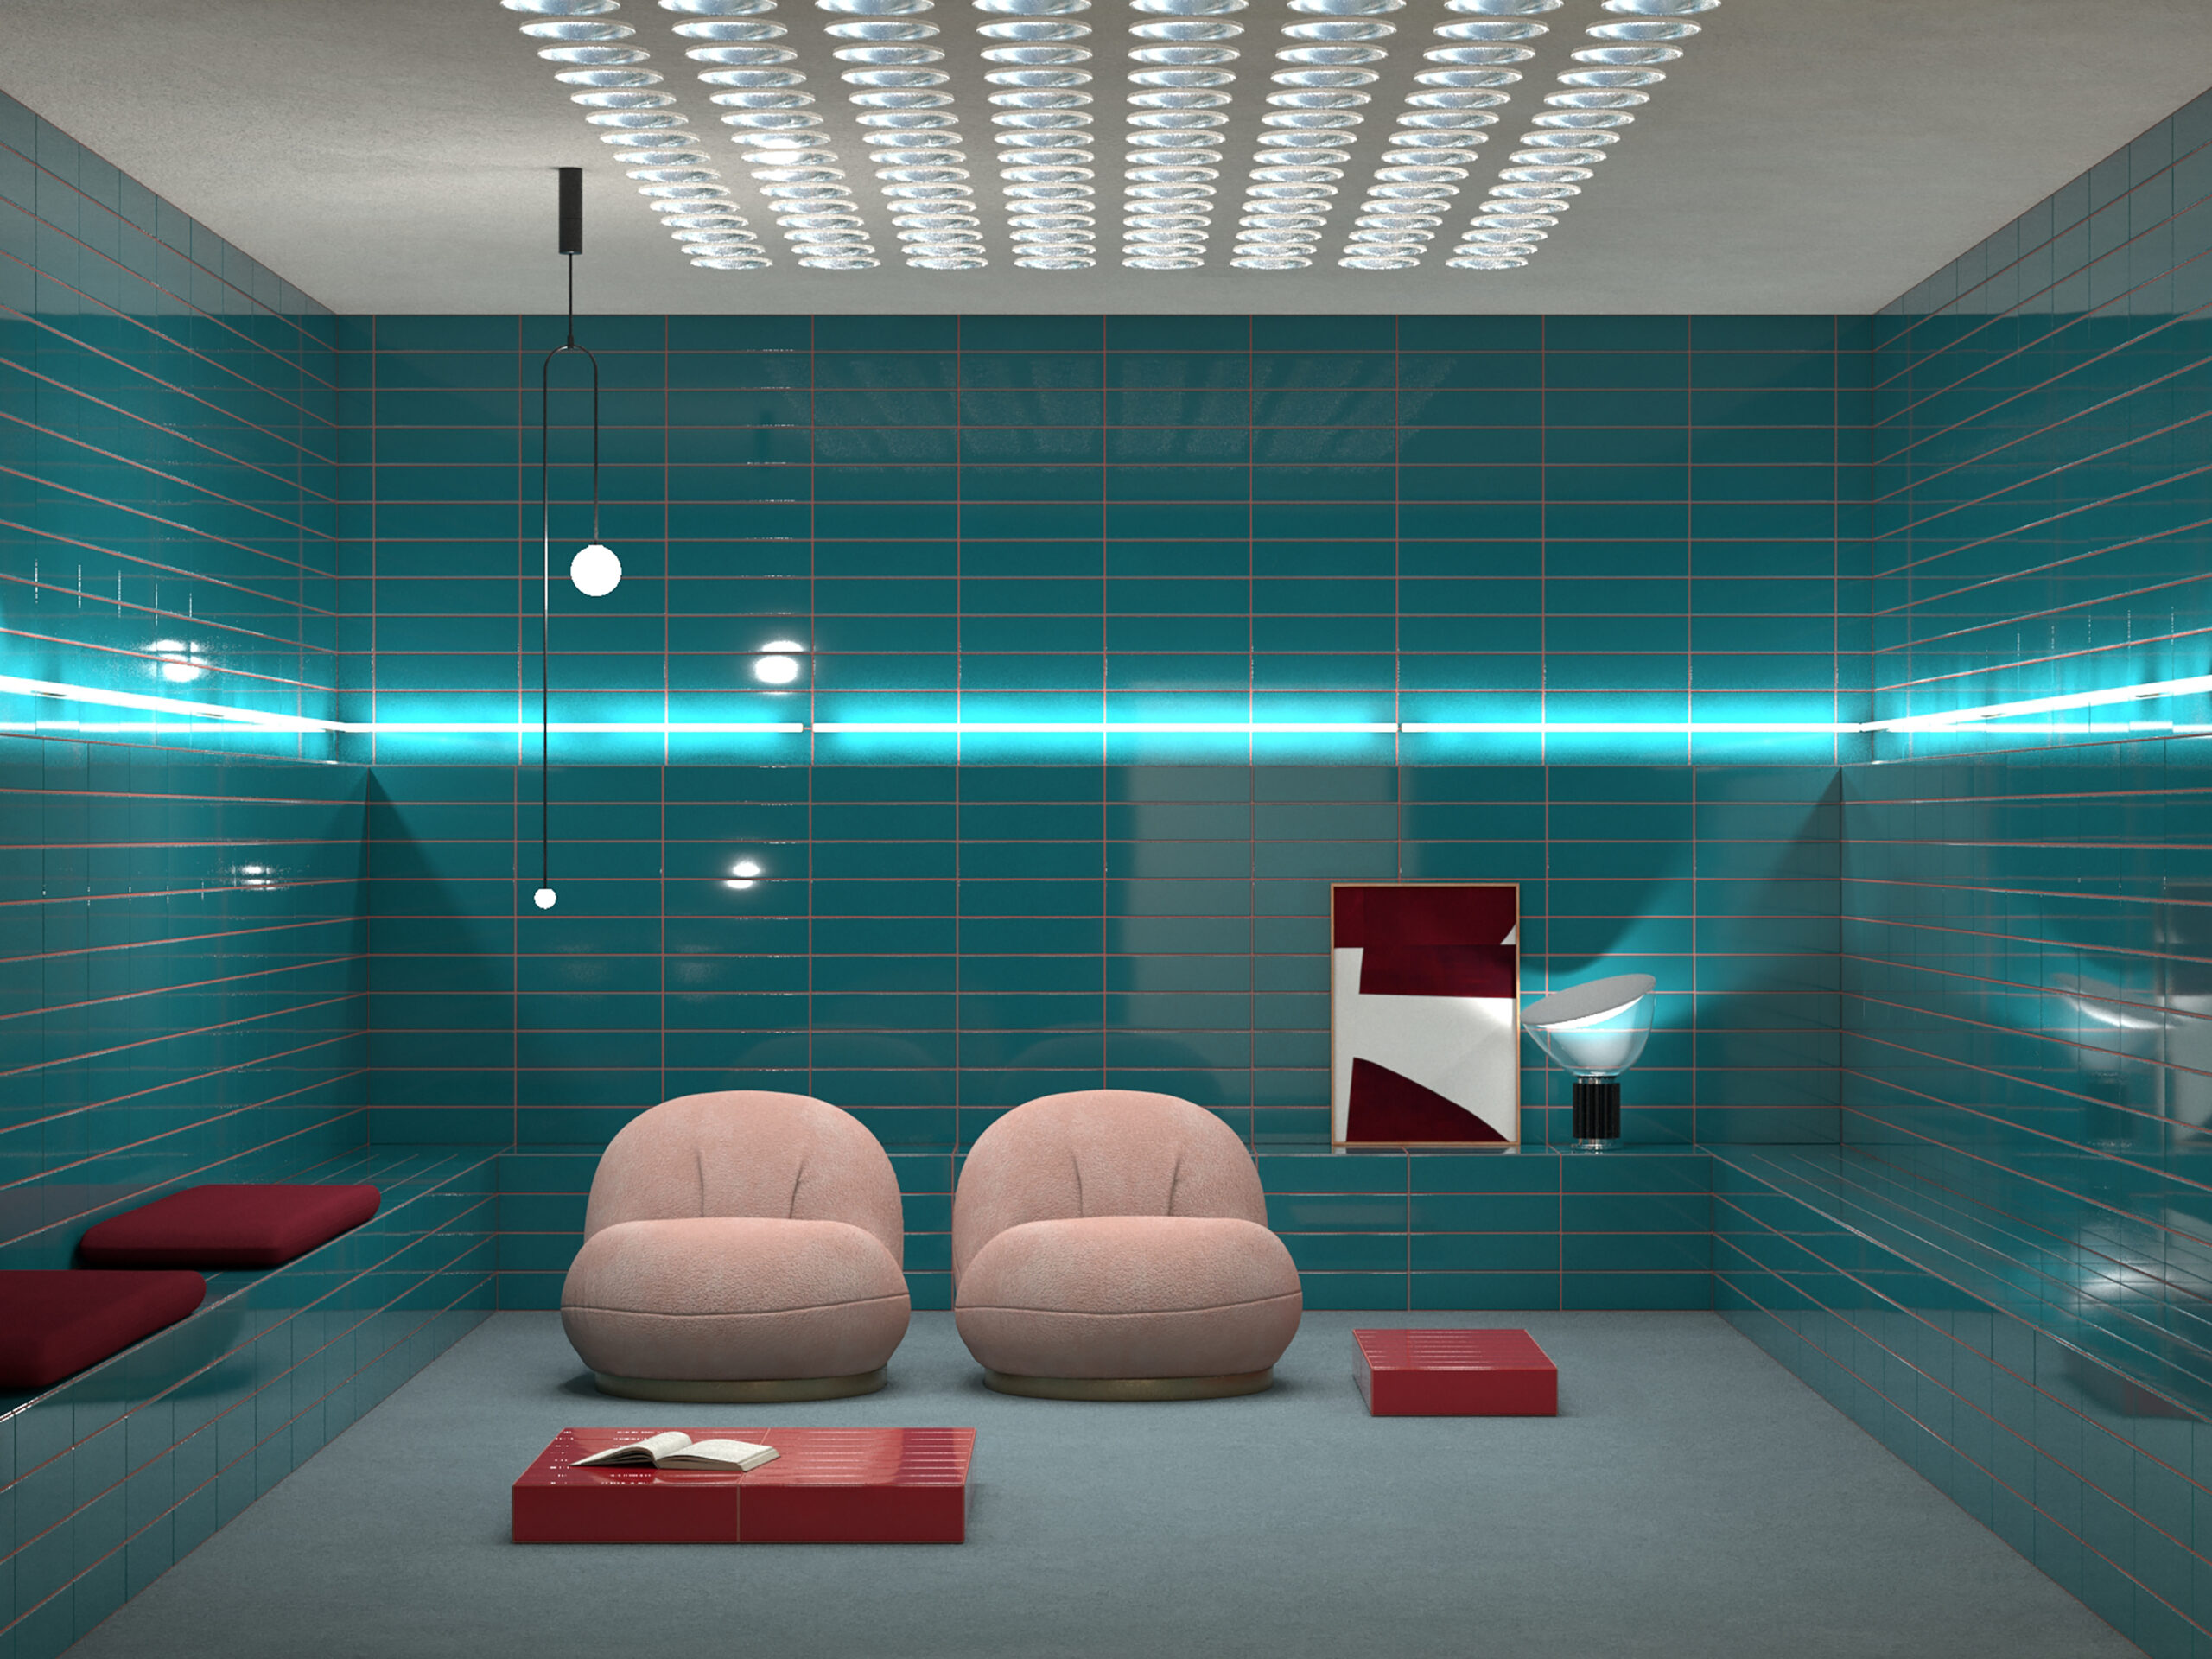 CROMIA – minimalism as inspiration